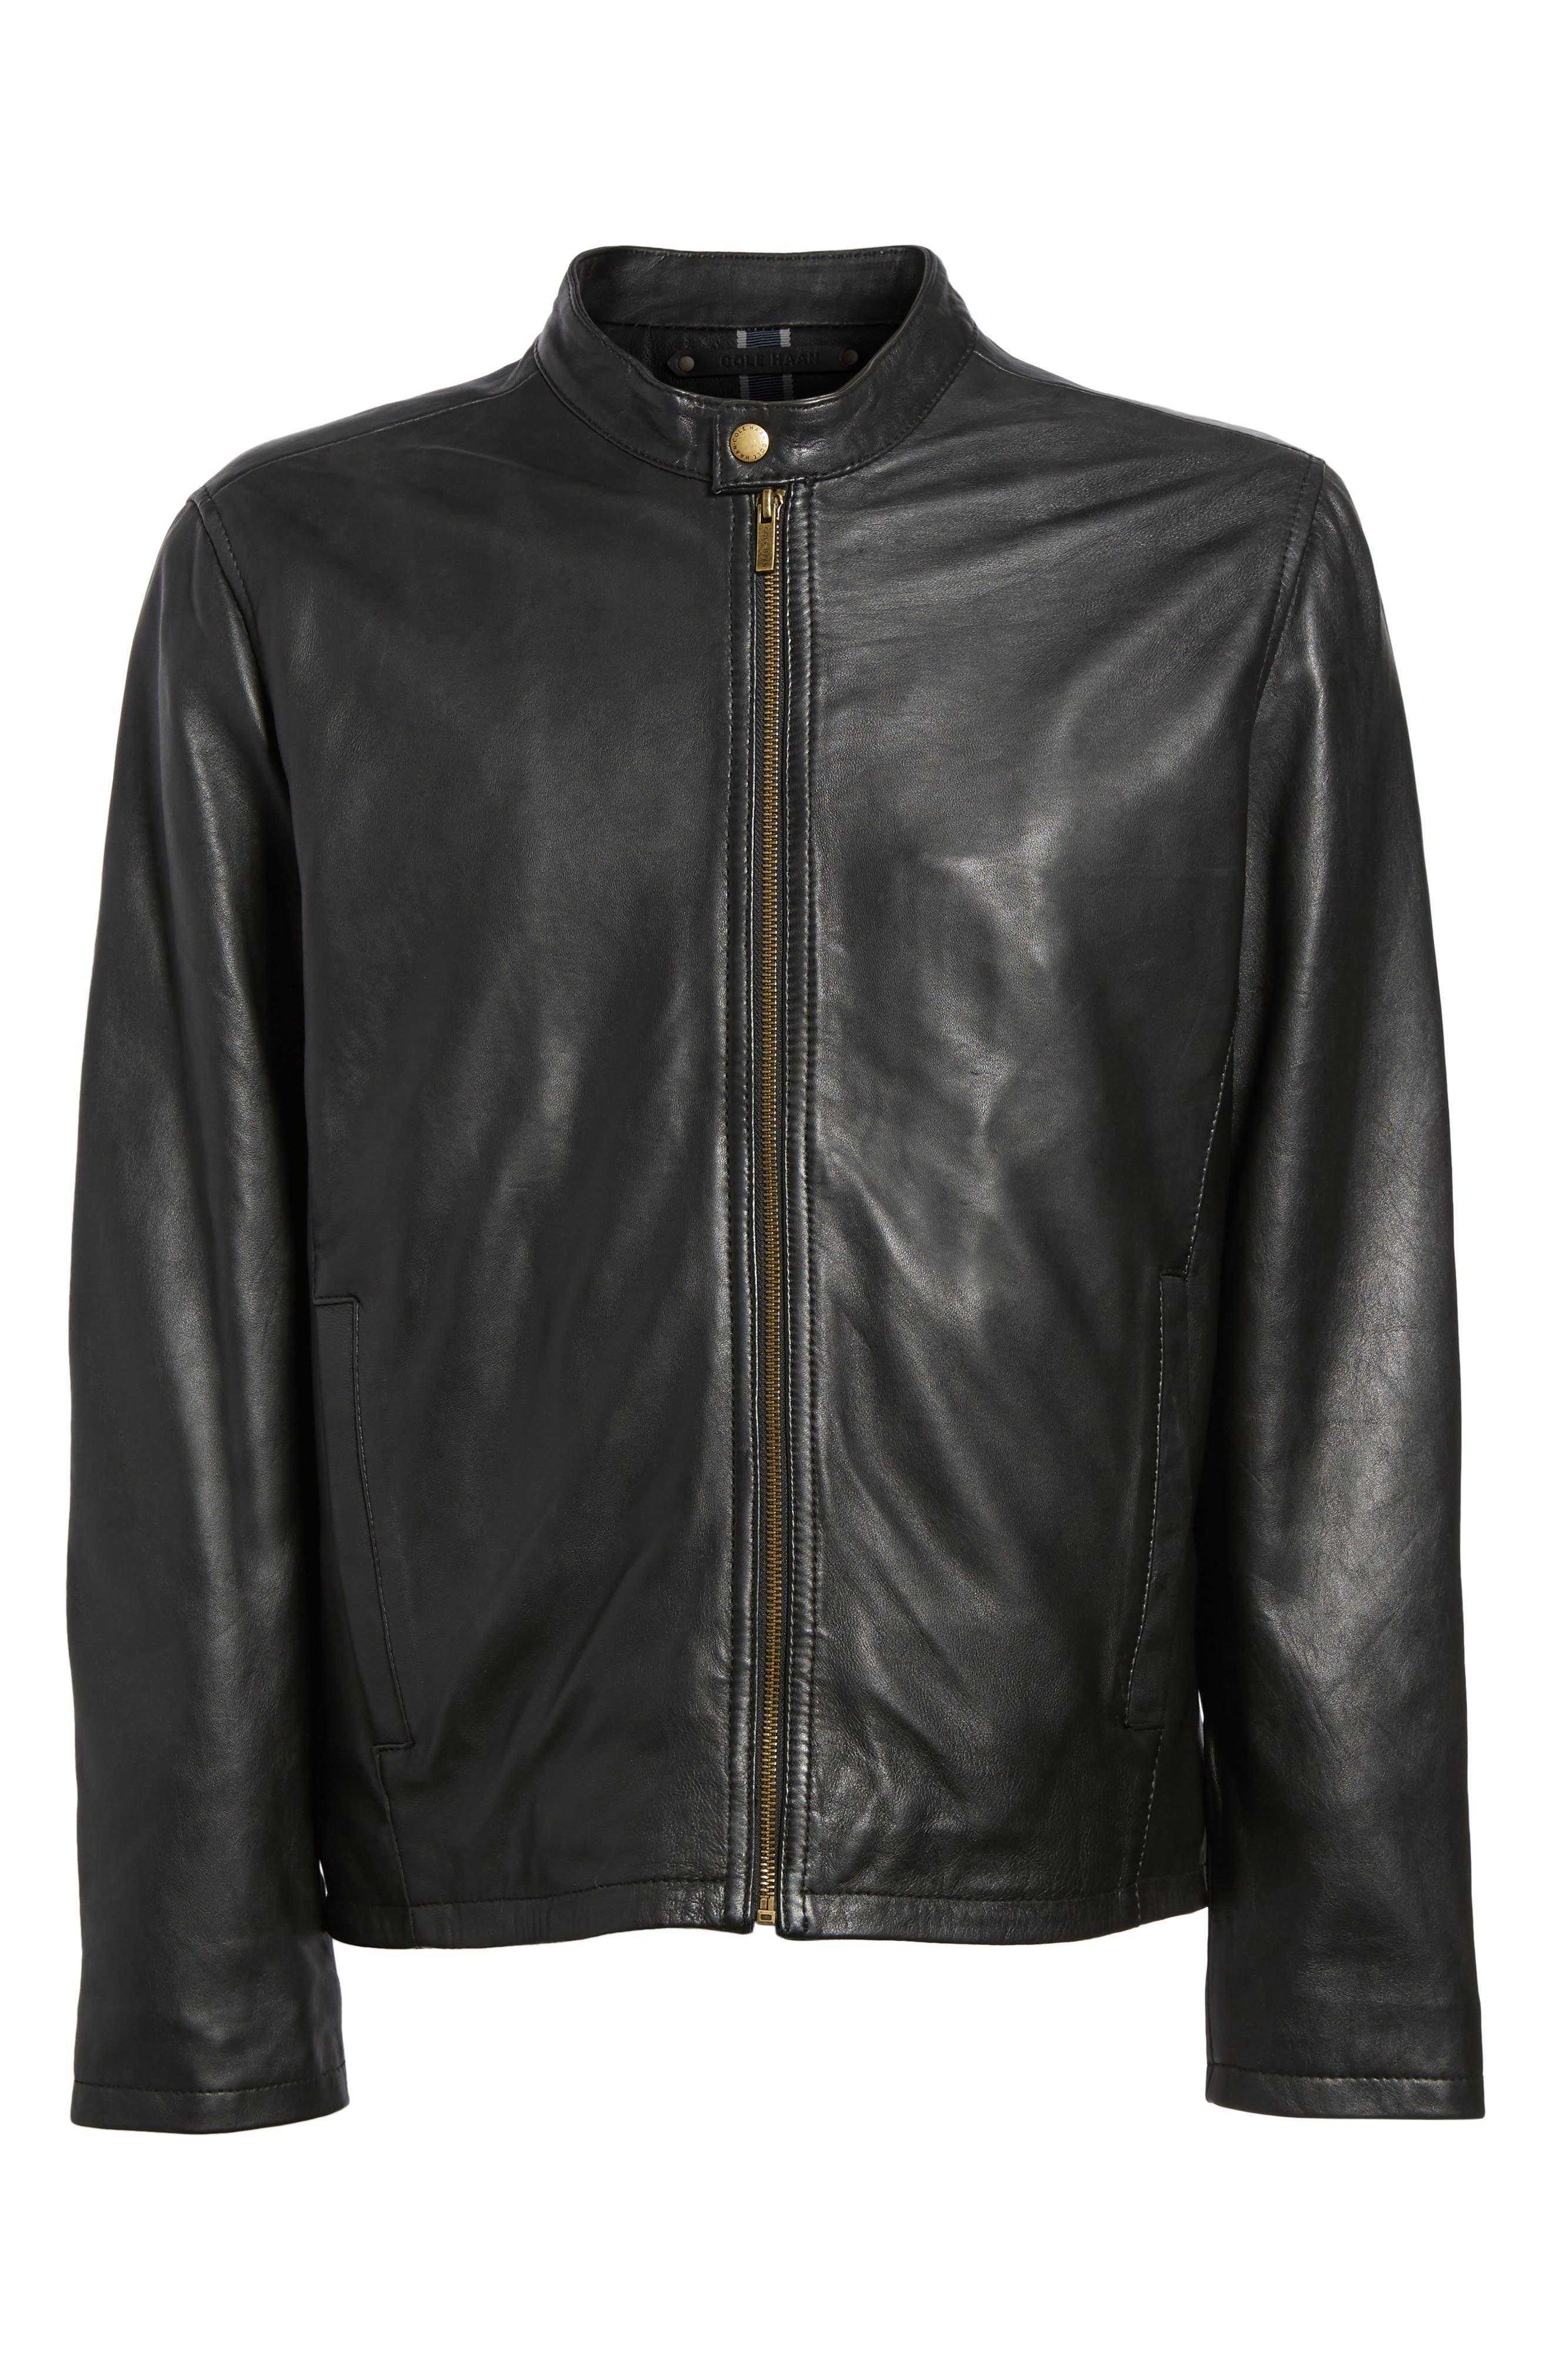 COLE HAAN, Lambskin Leather Moto Jacket, Alternate thumbnail 6, color, 001